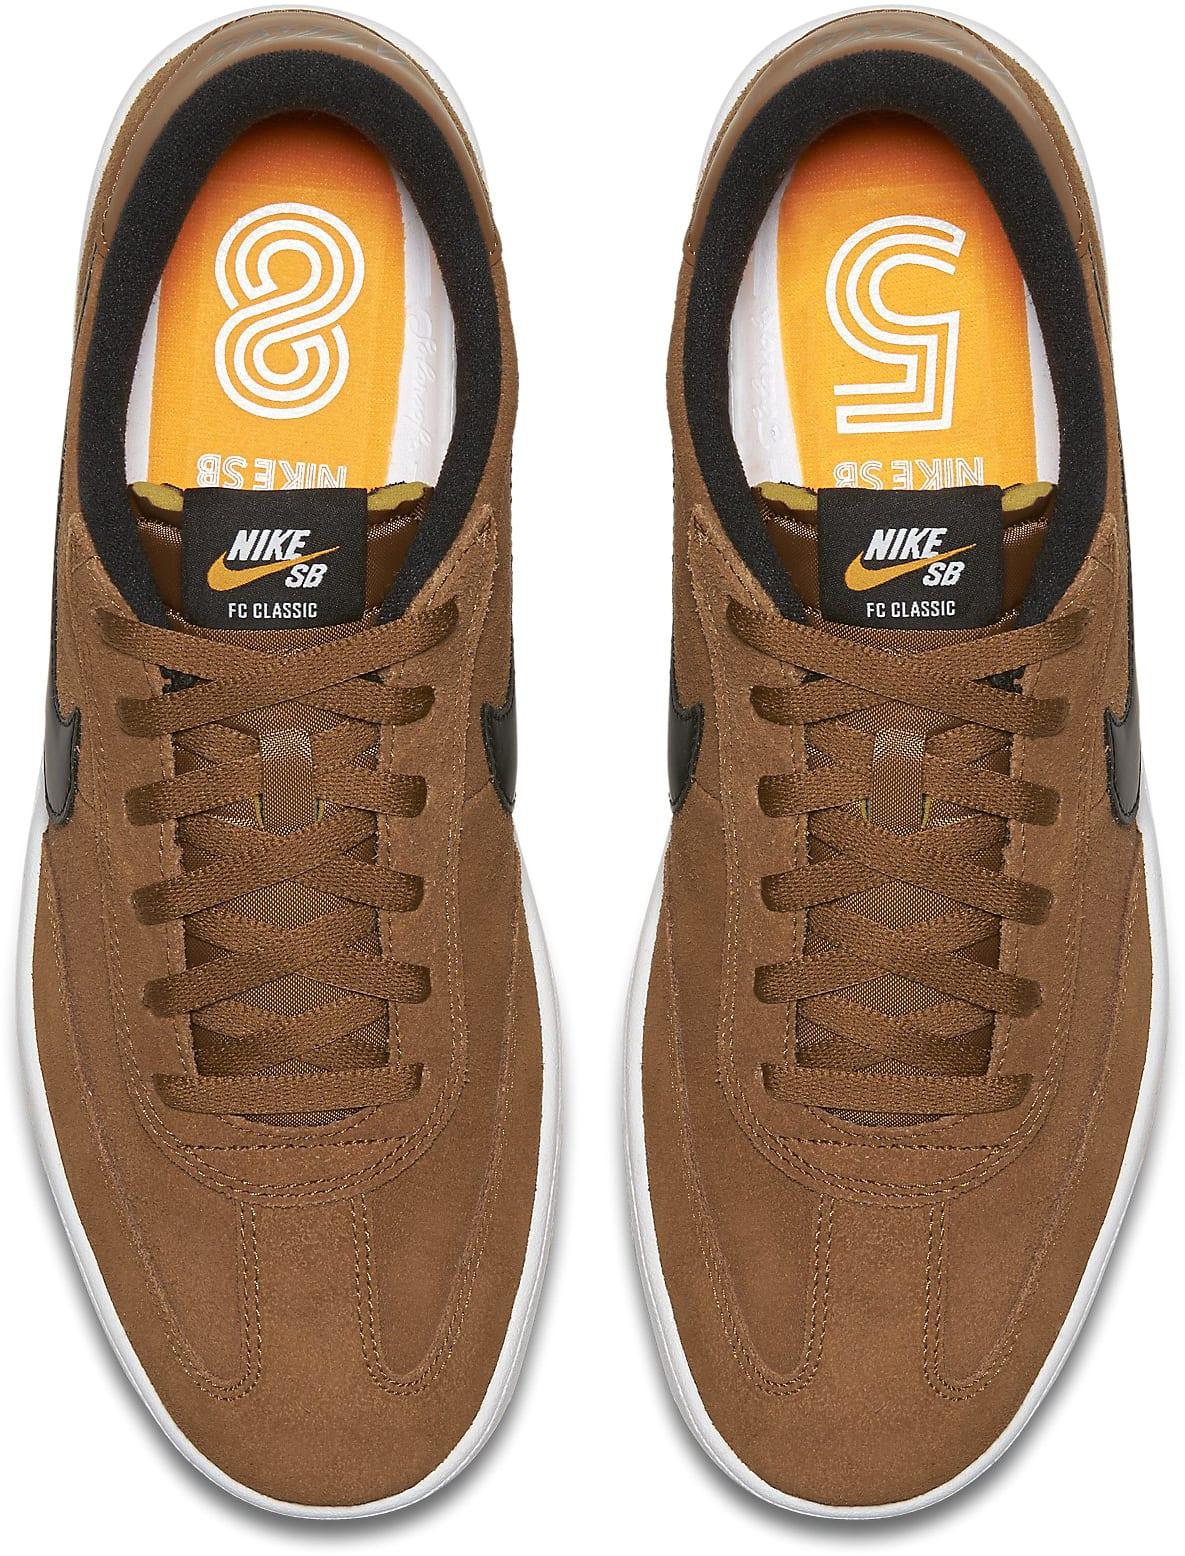 9bee1609882b59 Nike SB FC Classic Skate Shoes - thumbnail 4